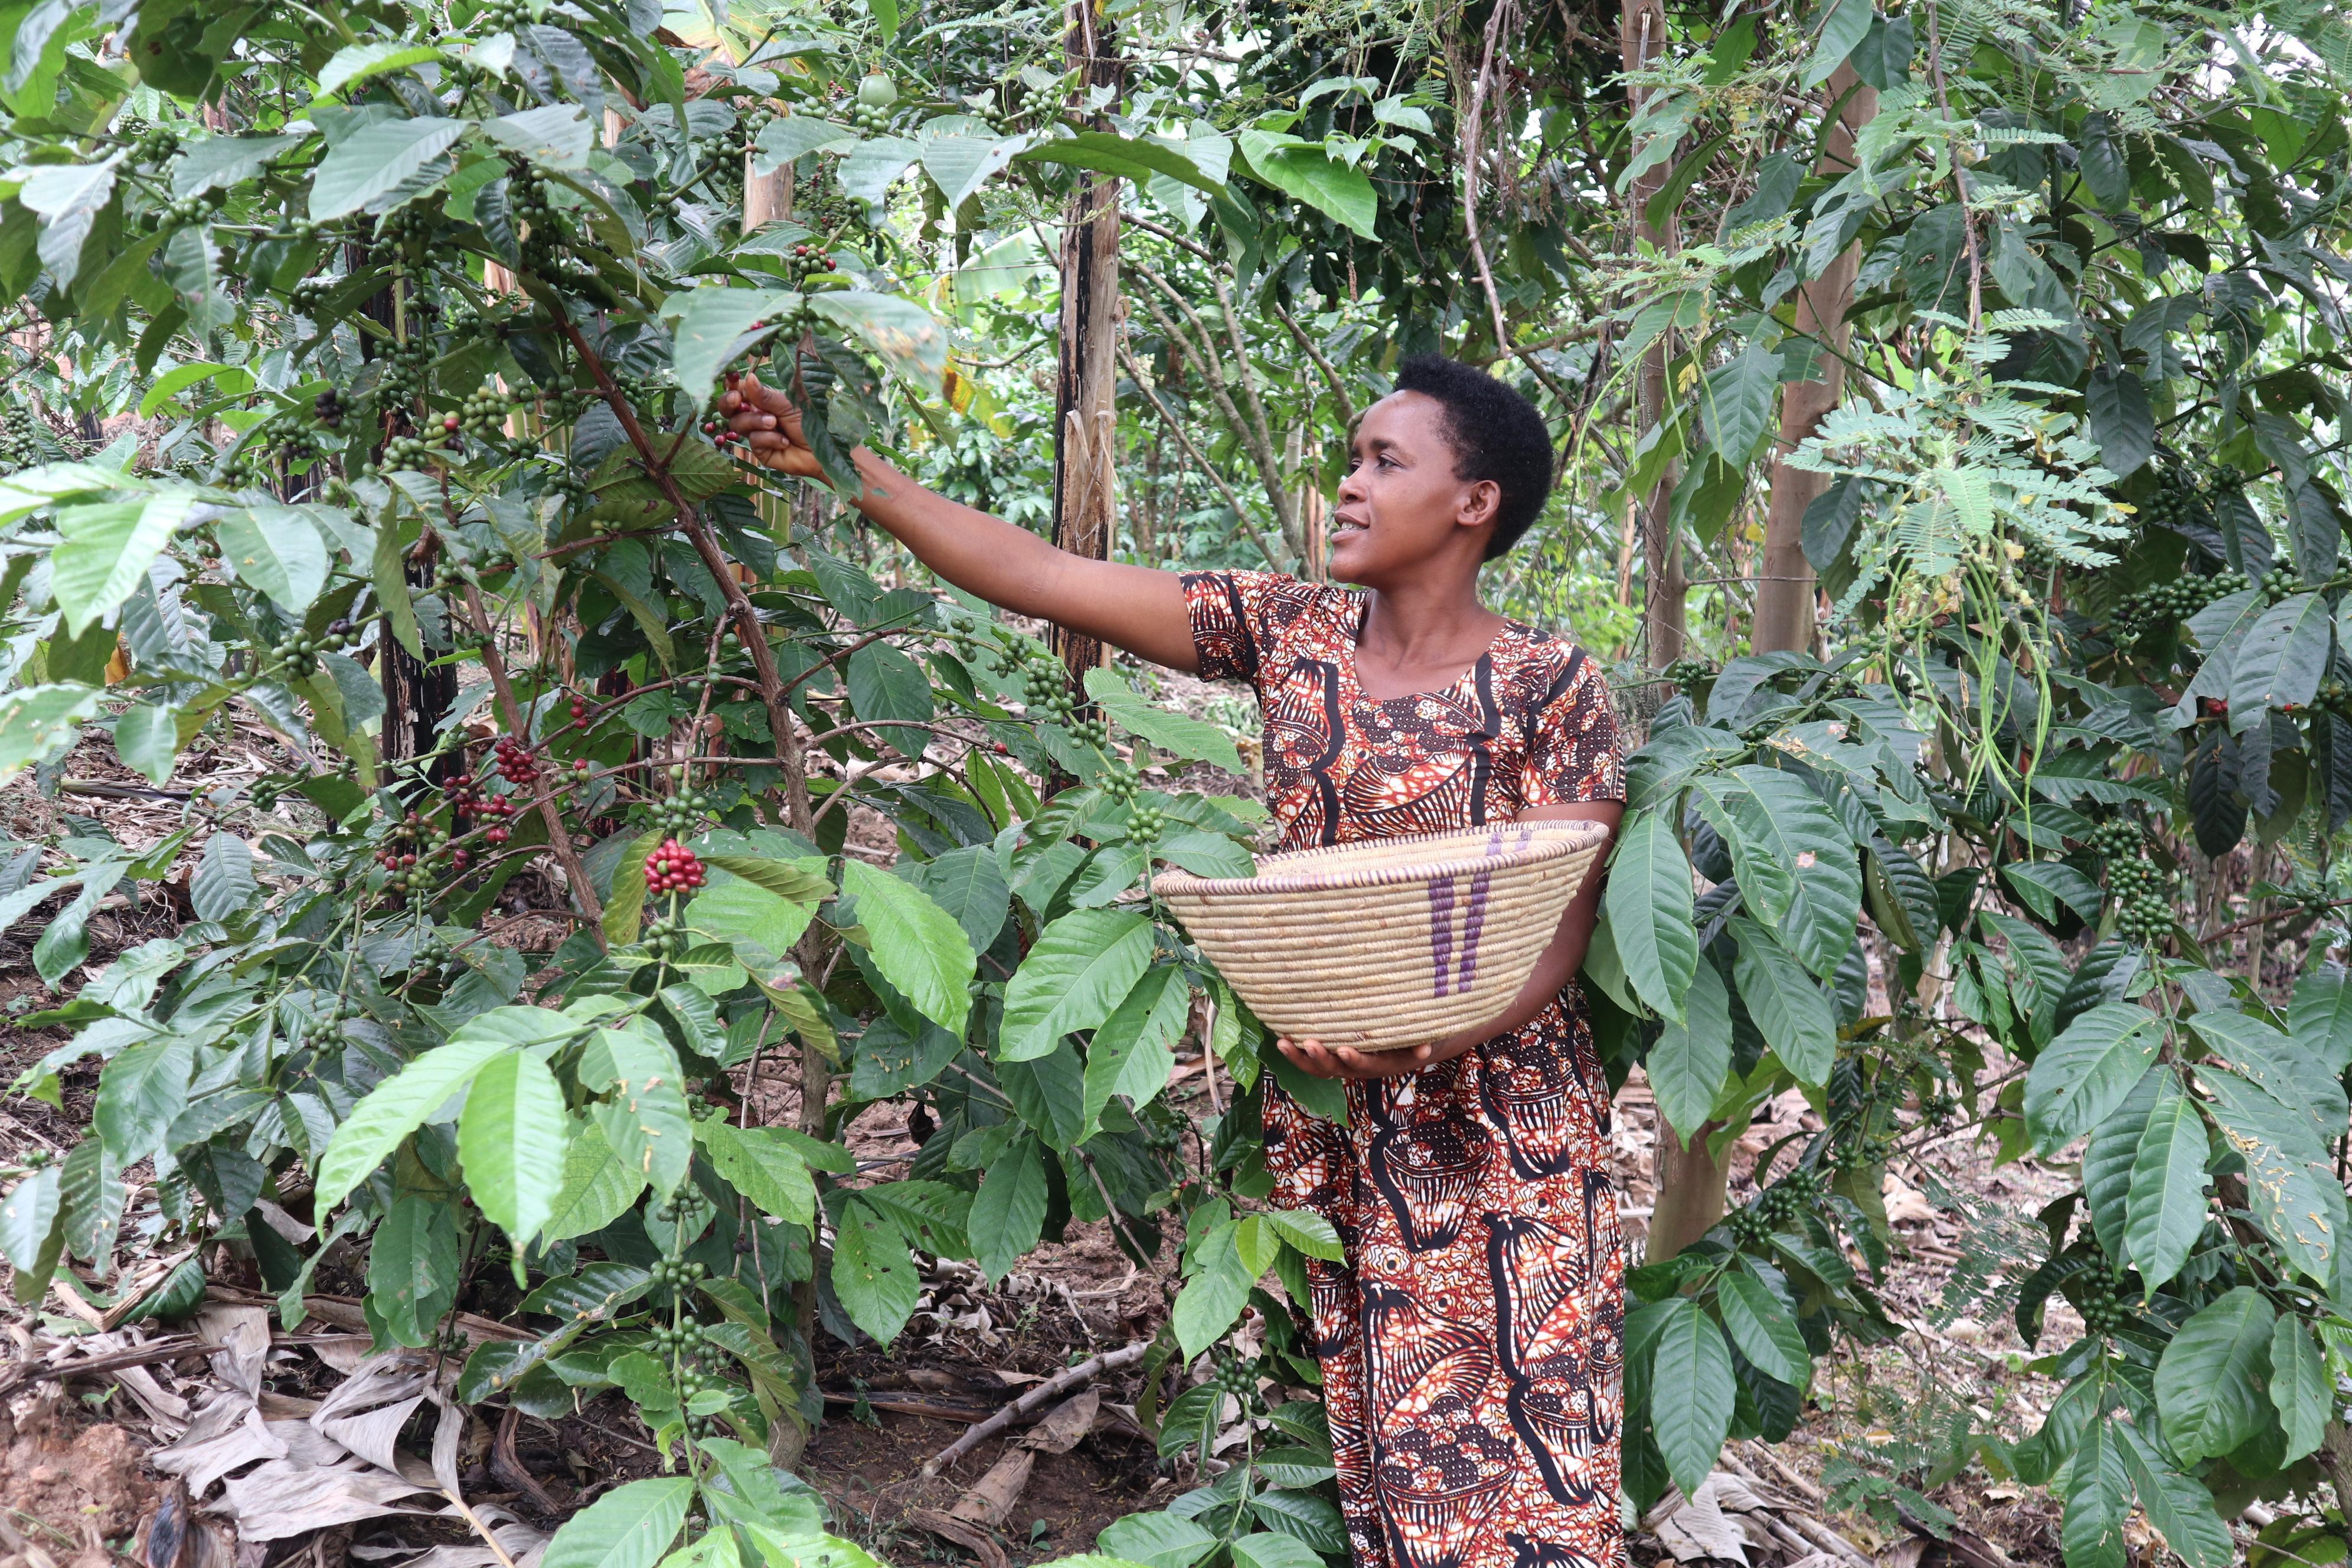 Growing resilient agricultural enterprises